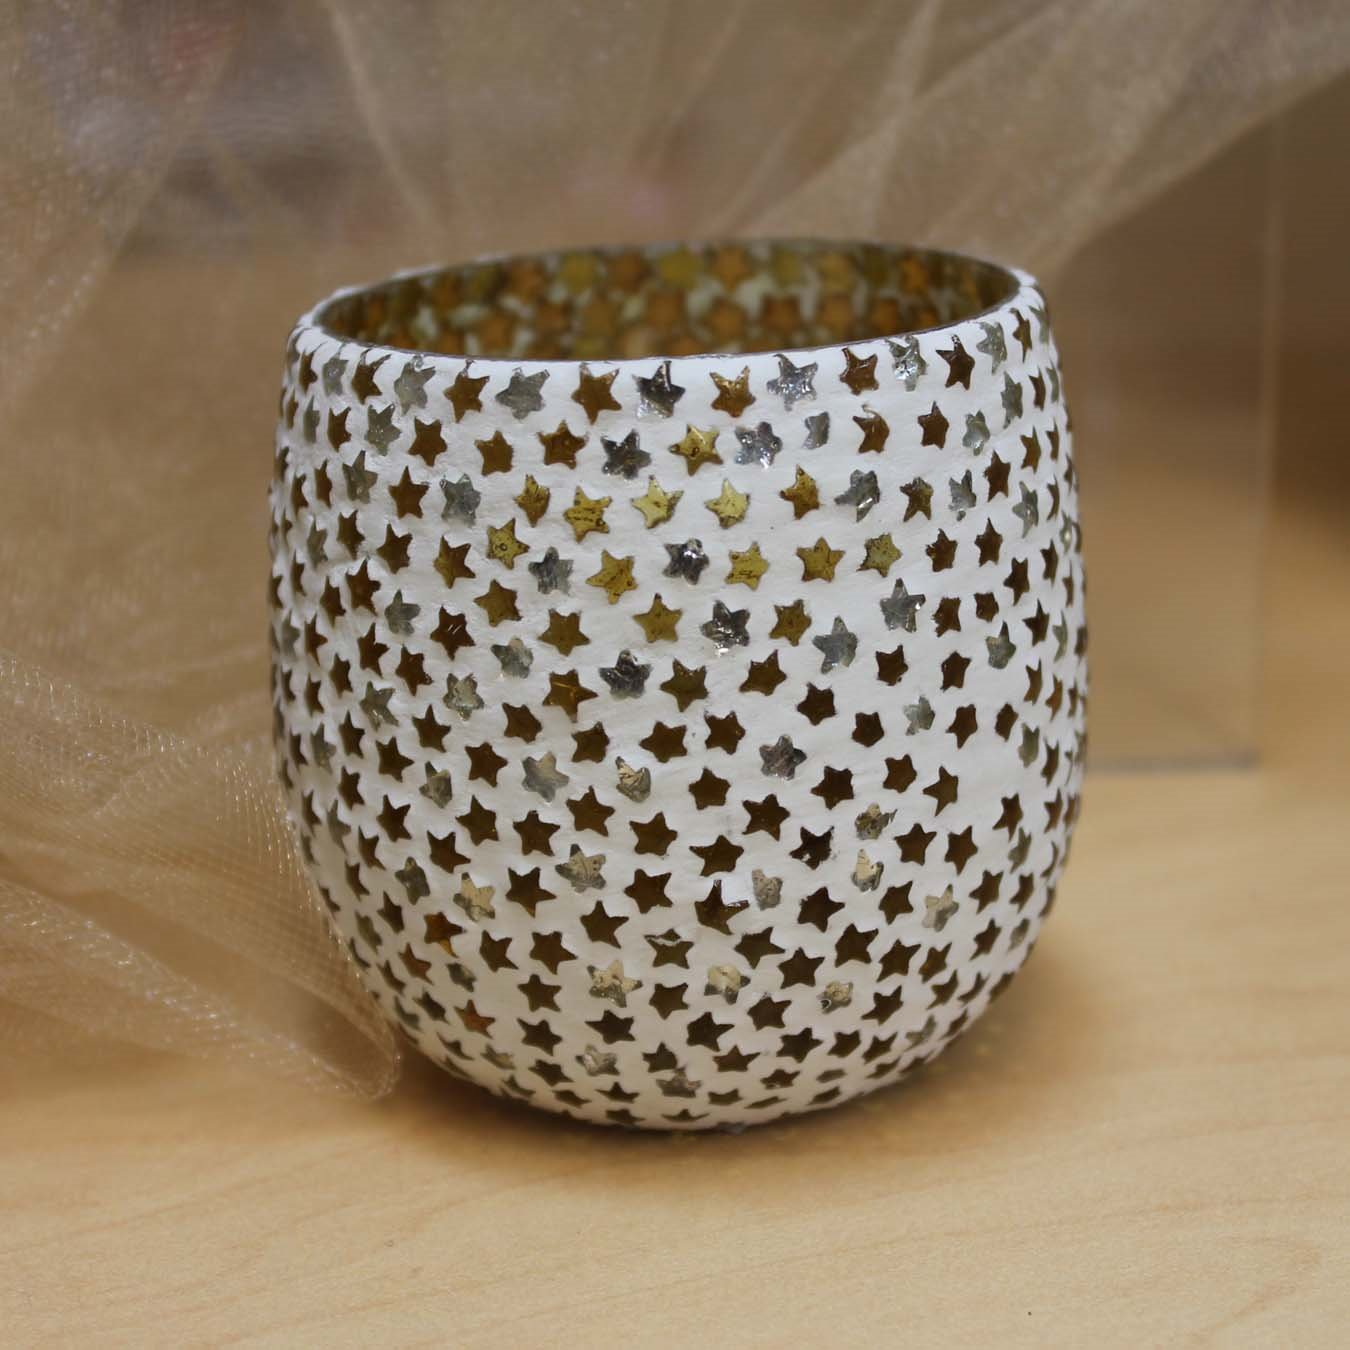 Stars Glass Mosaic Tealight Holder